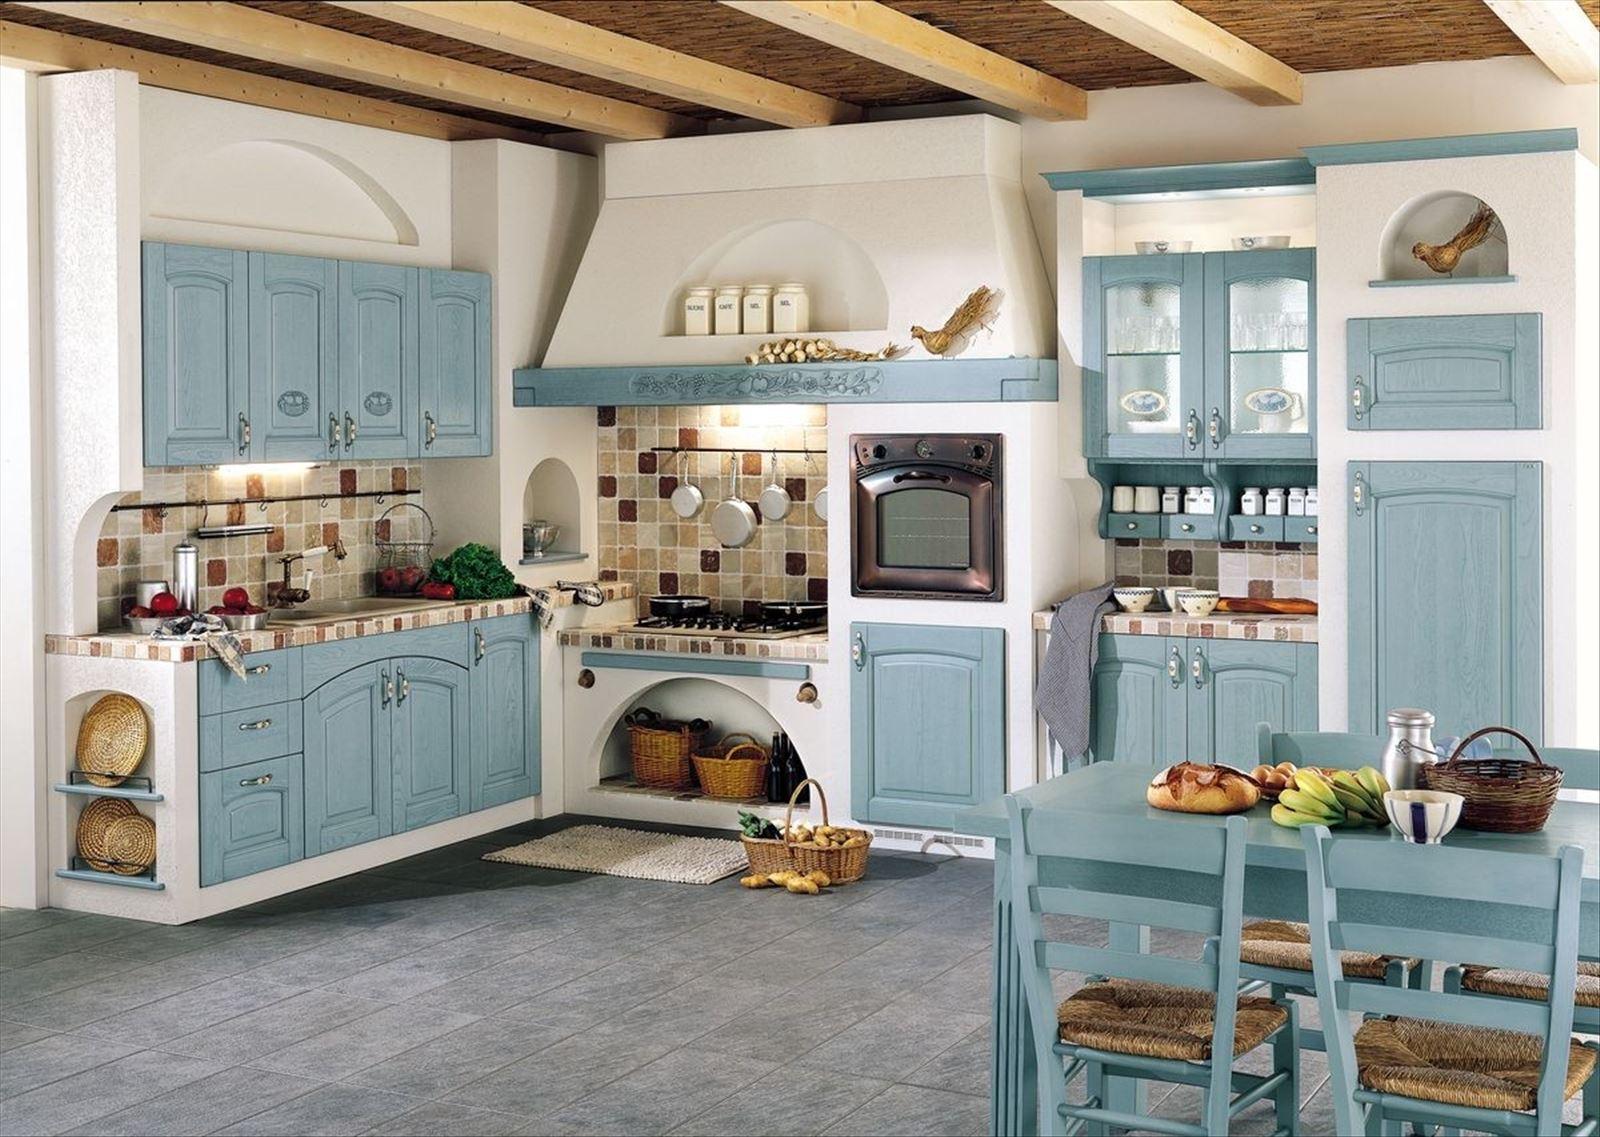 слову, кухни в стиле прованс все картинки чем через сто